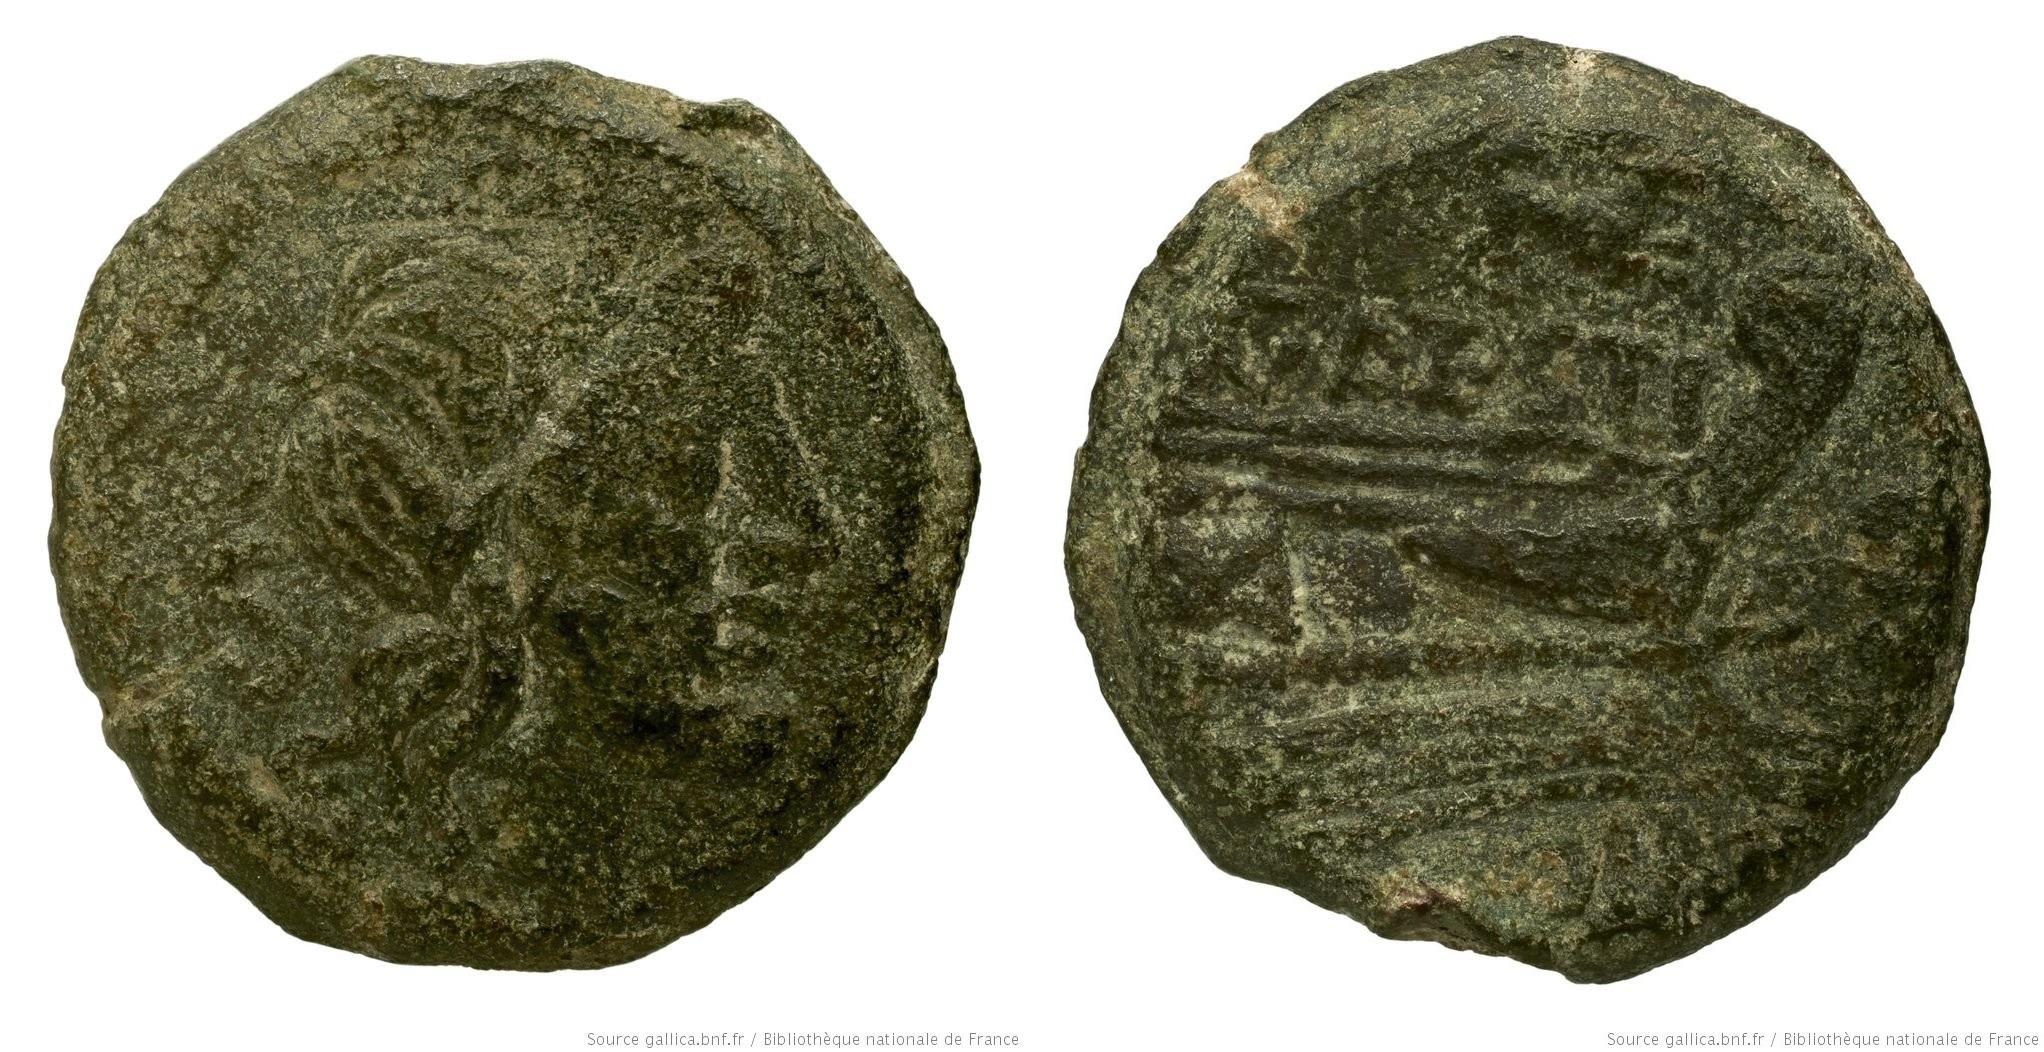 894AN – Semis Antestia – Caius Antestius